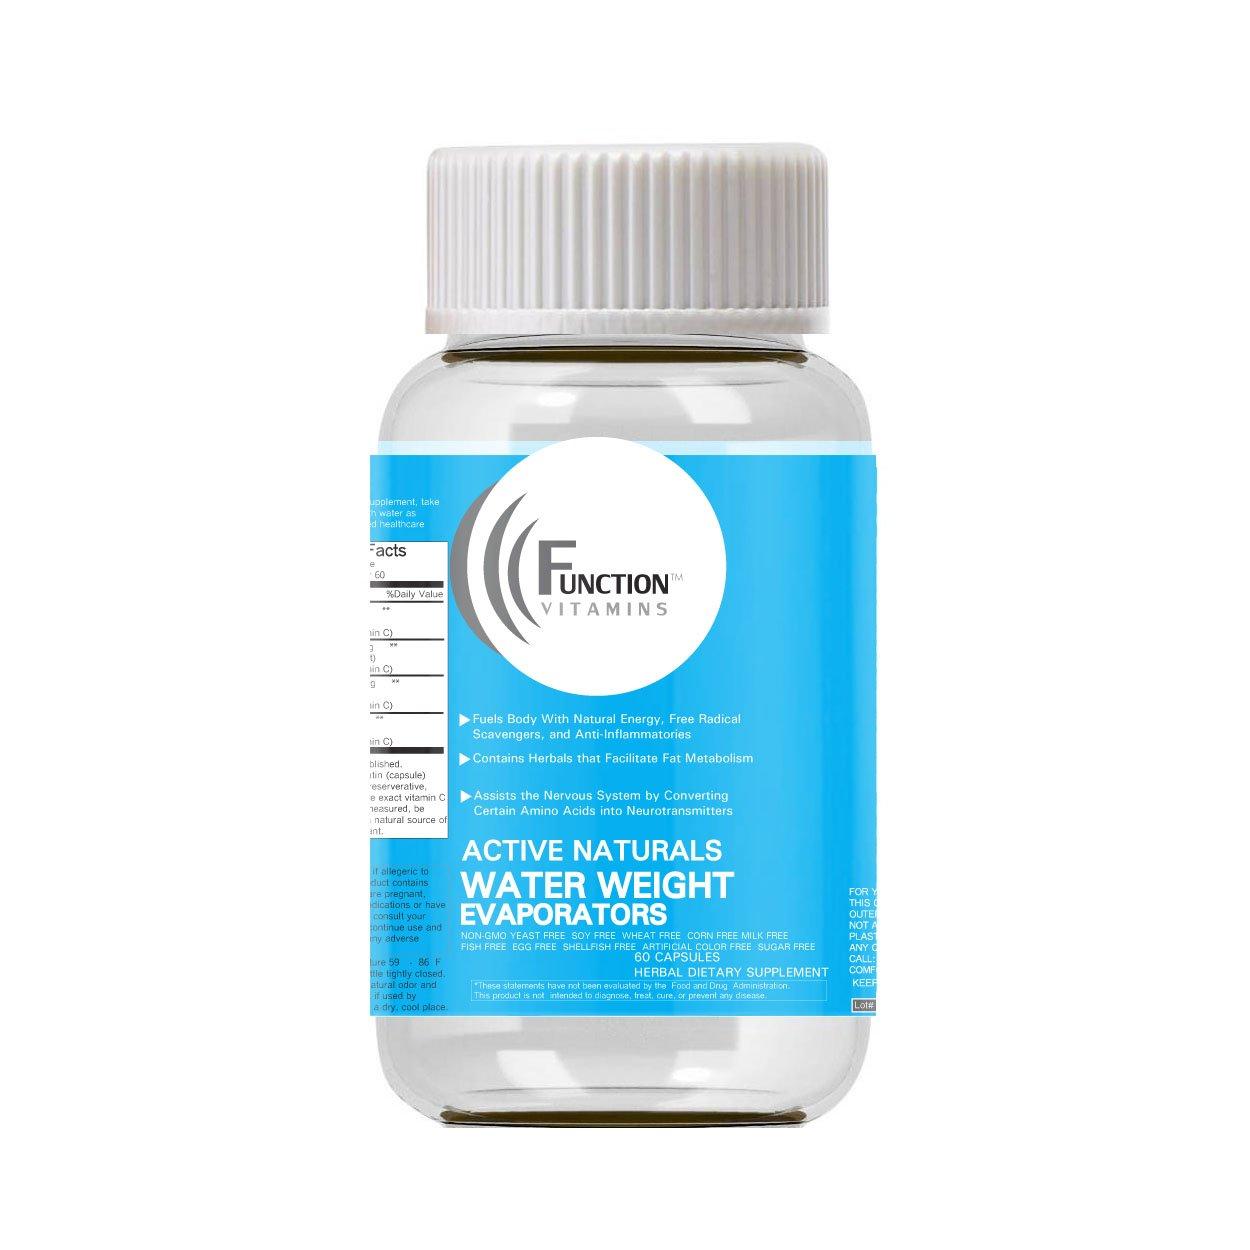 H20 Water Weight Evaporator Diet Capsules, ORGANIC